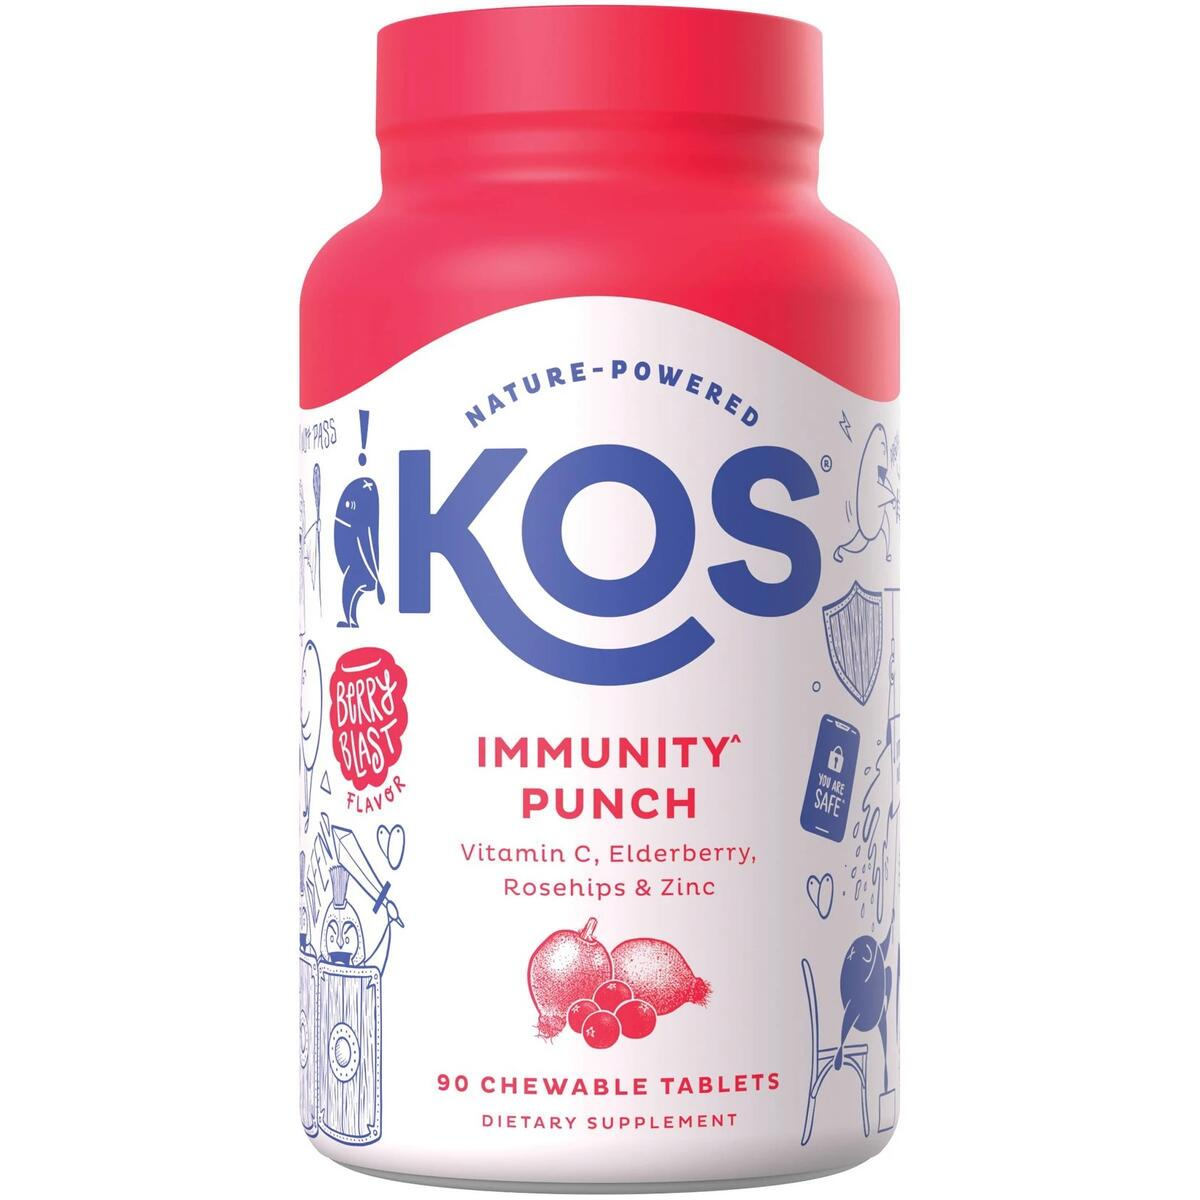 KOS Immunity Punch Chewable Tablets - Berry Blast - 90ct